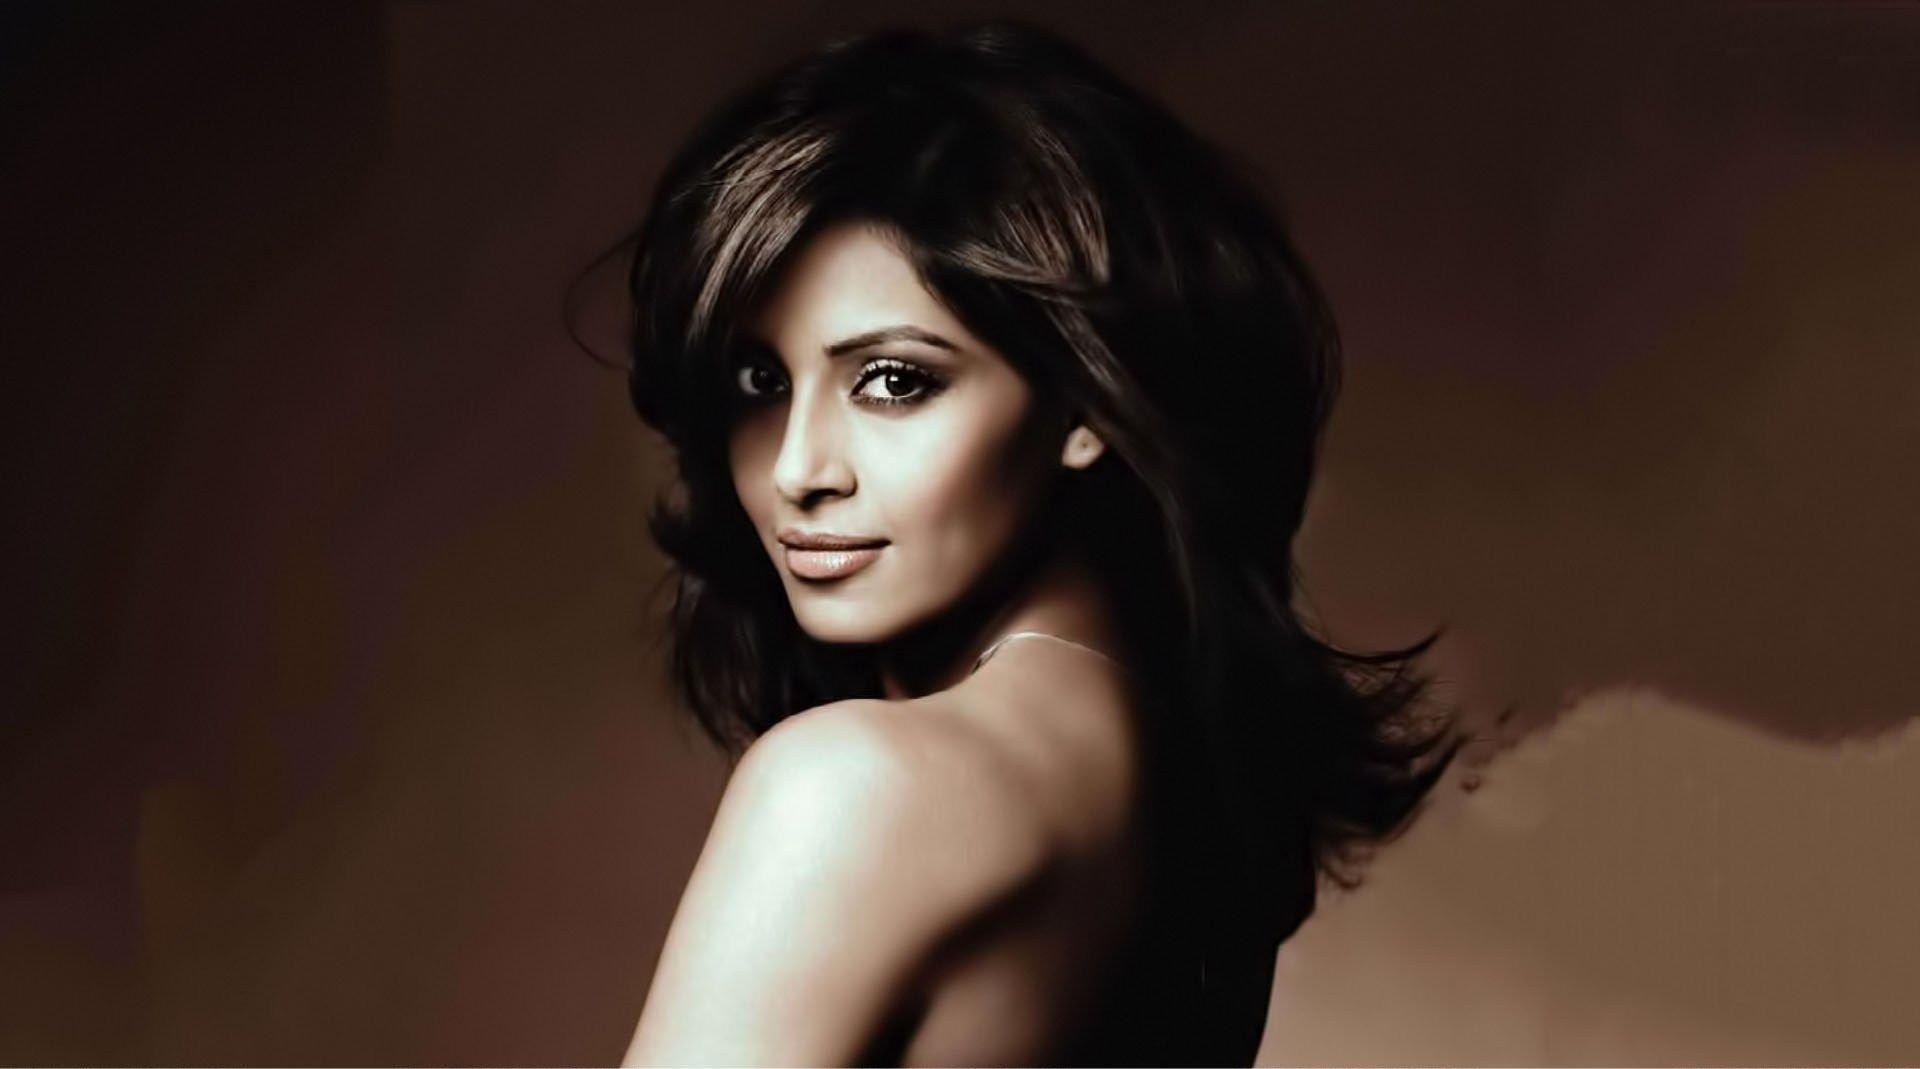 Bipasha Hot Video bold & beautiful, bipasha deserves applause for breaking